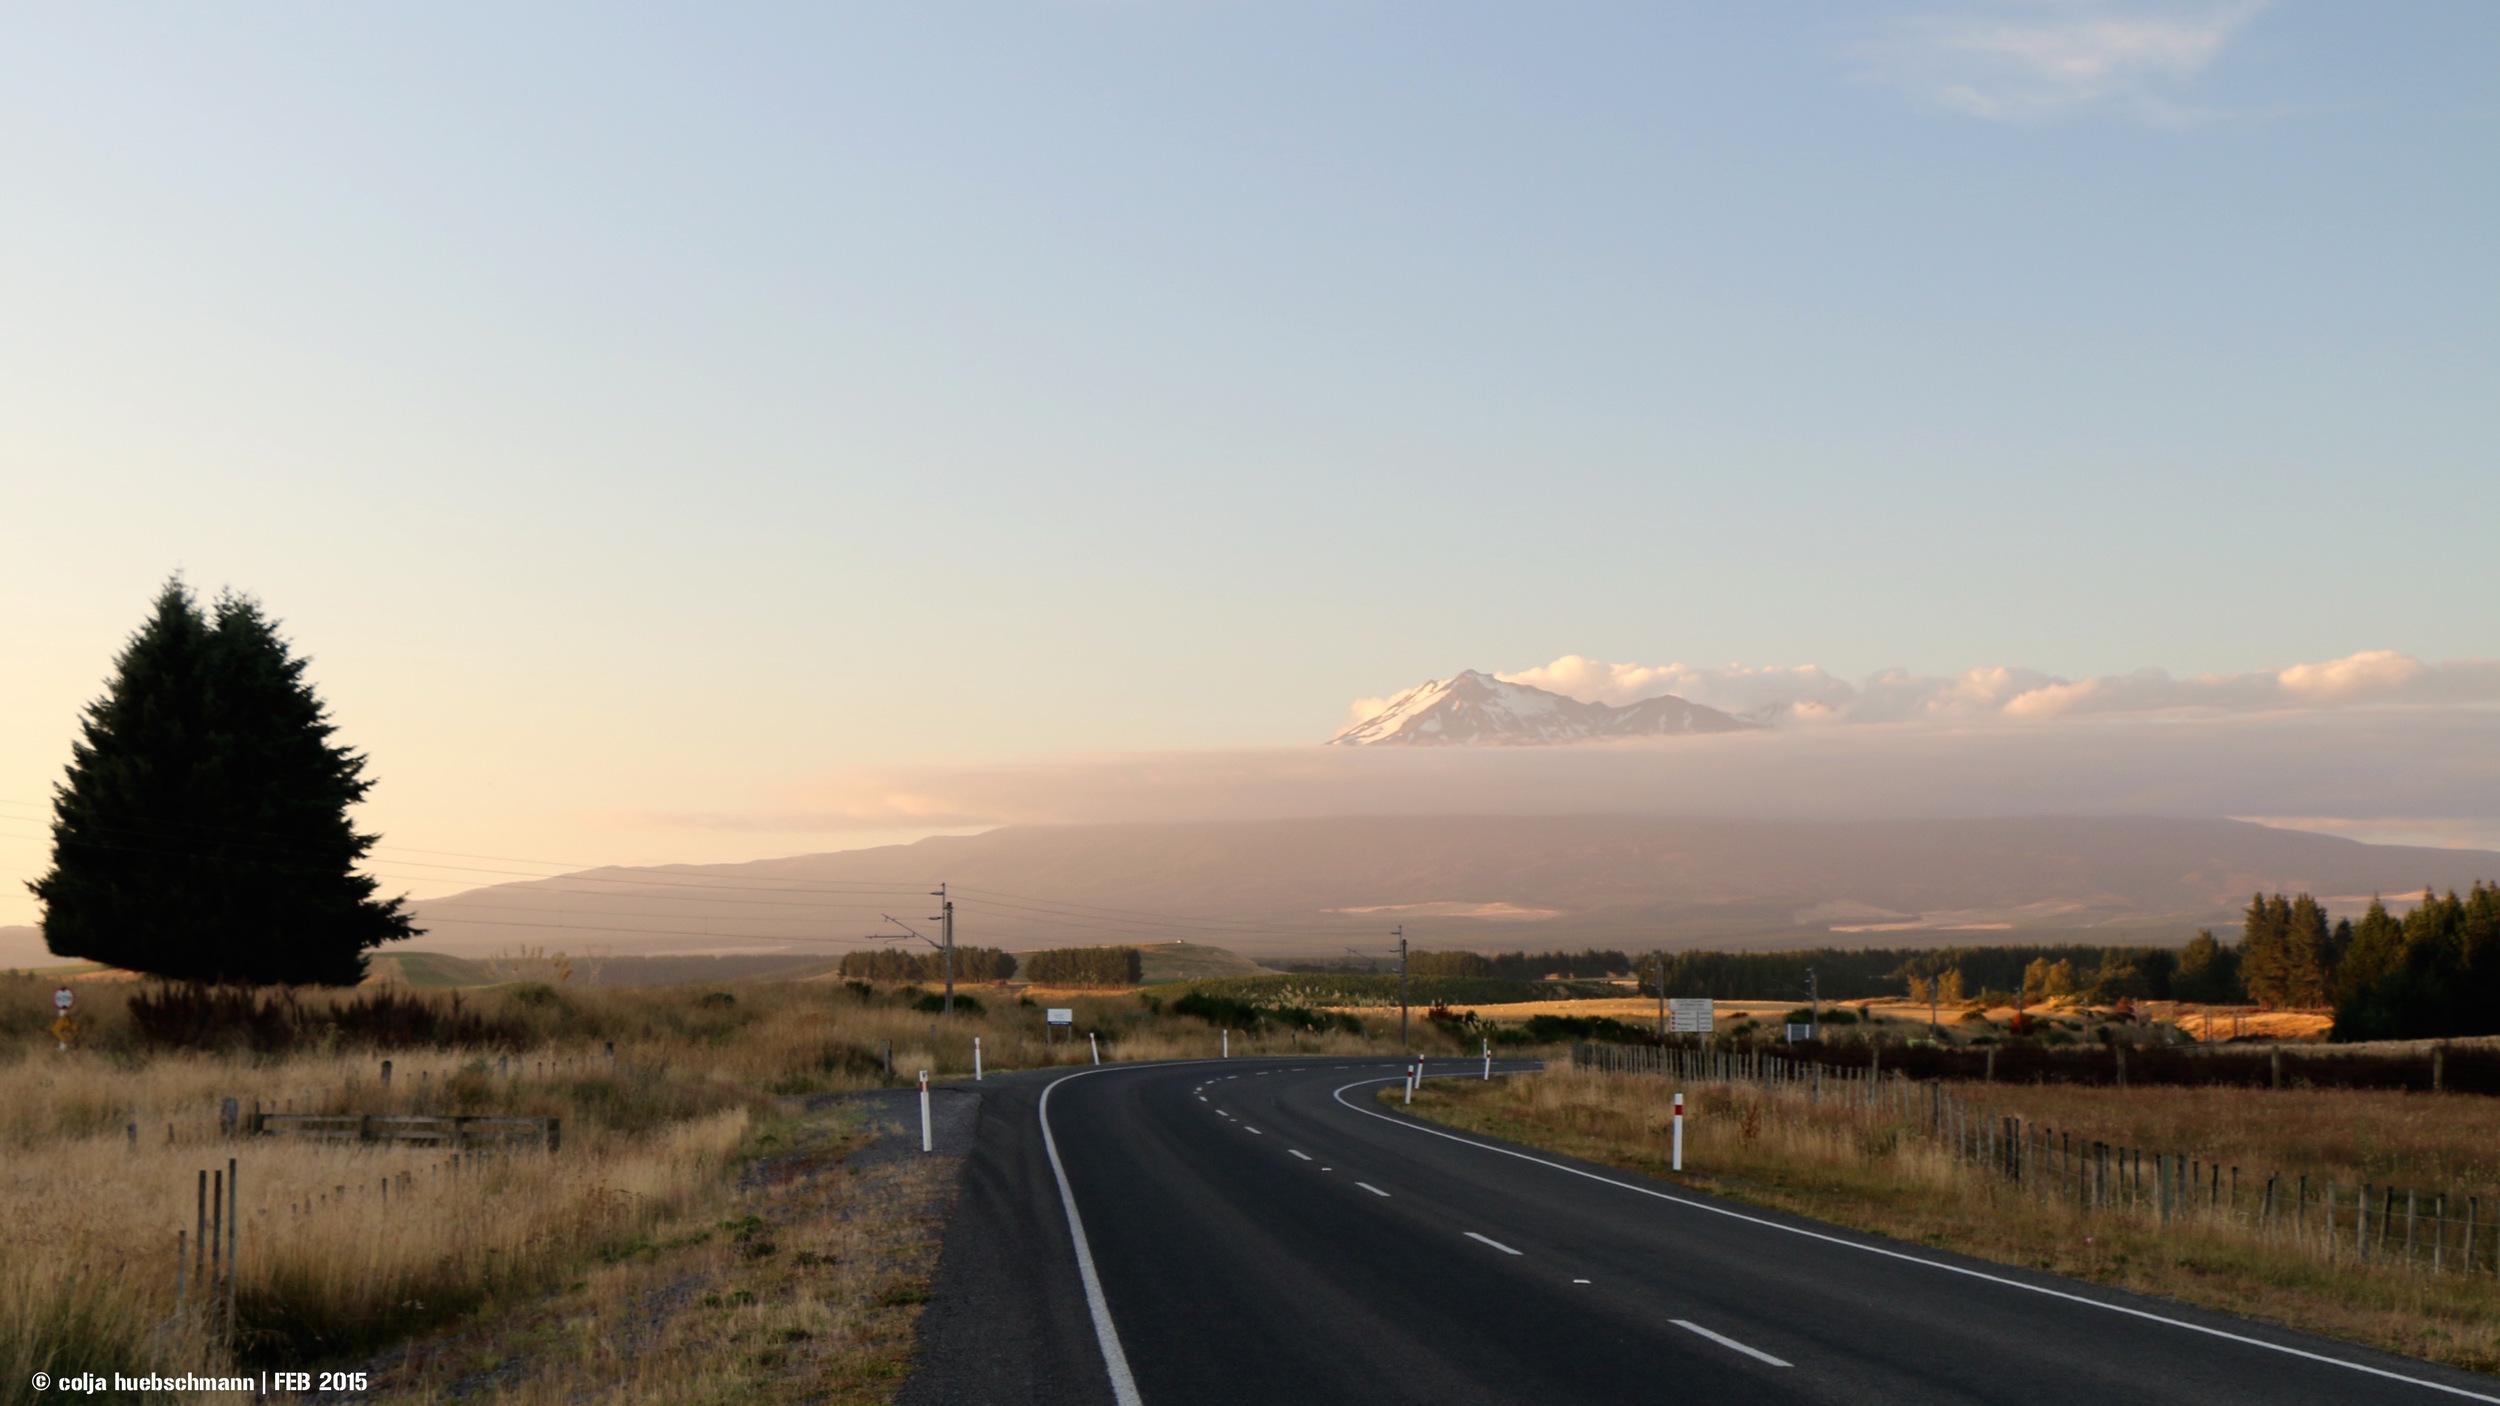 Tongariro National Park (Mt Ruhapeu)